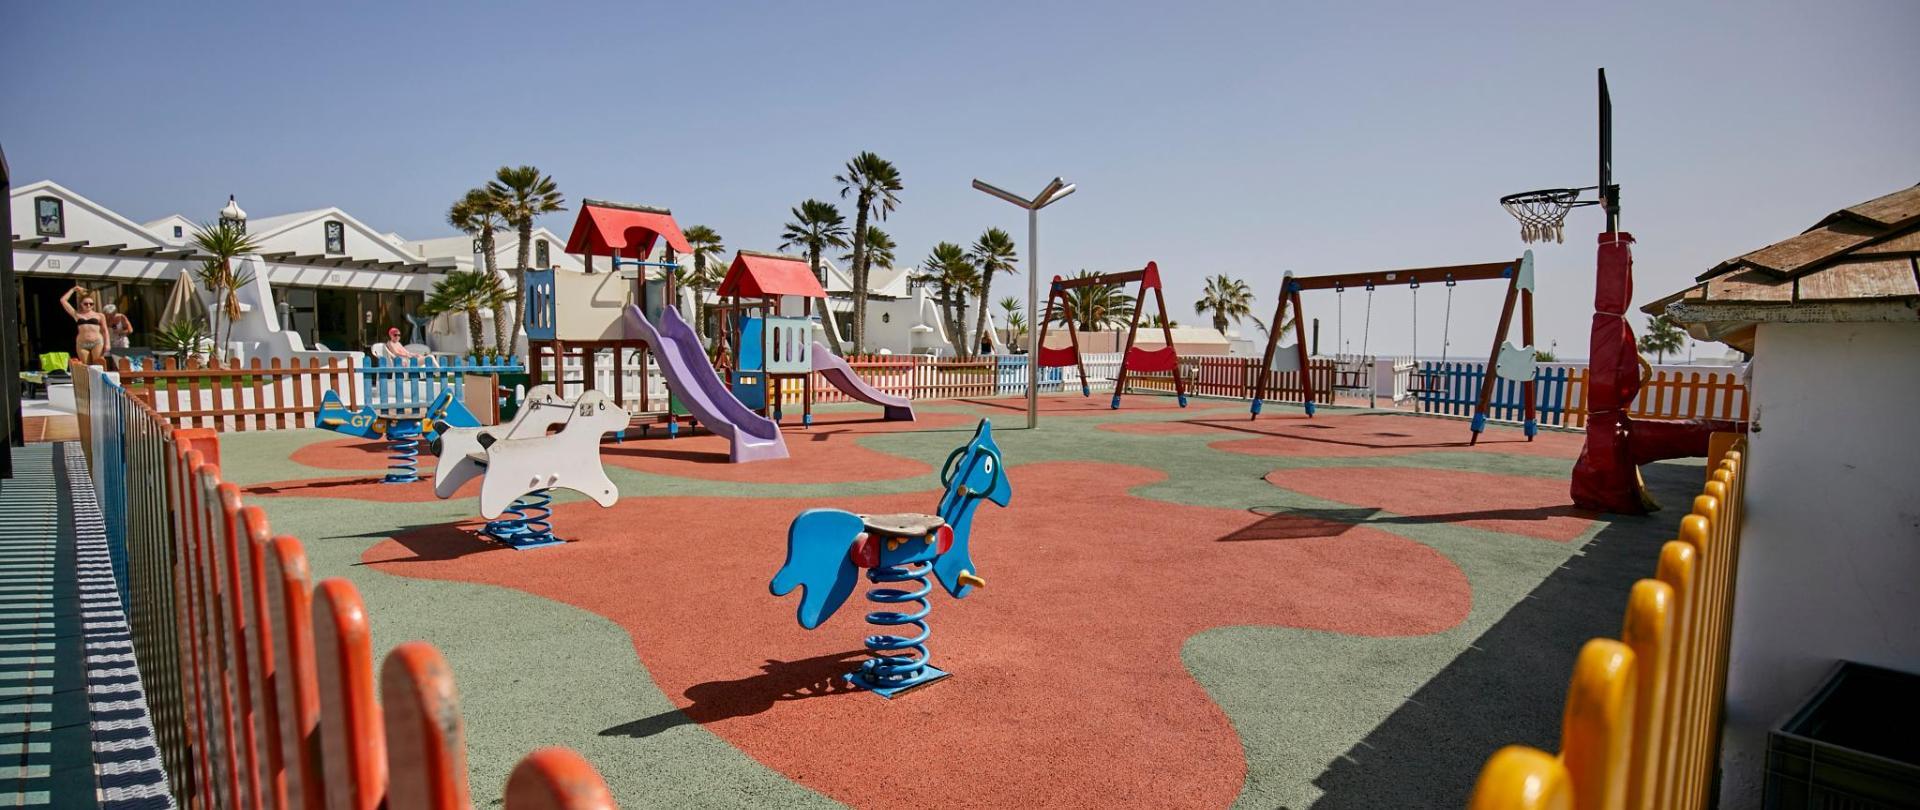 Play Ground Area.jpg